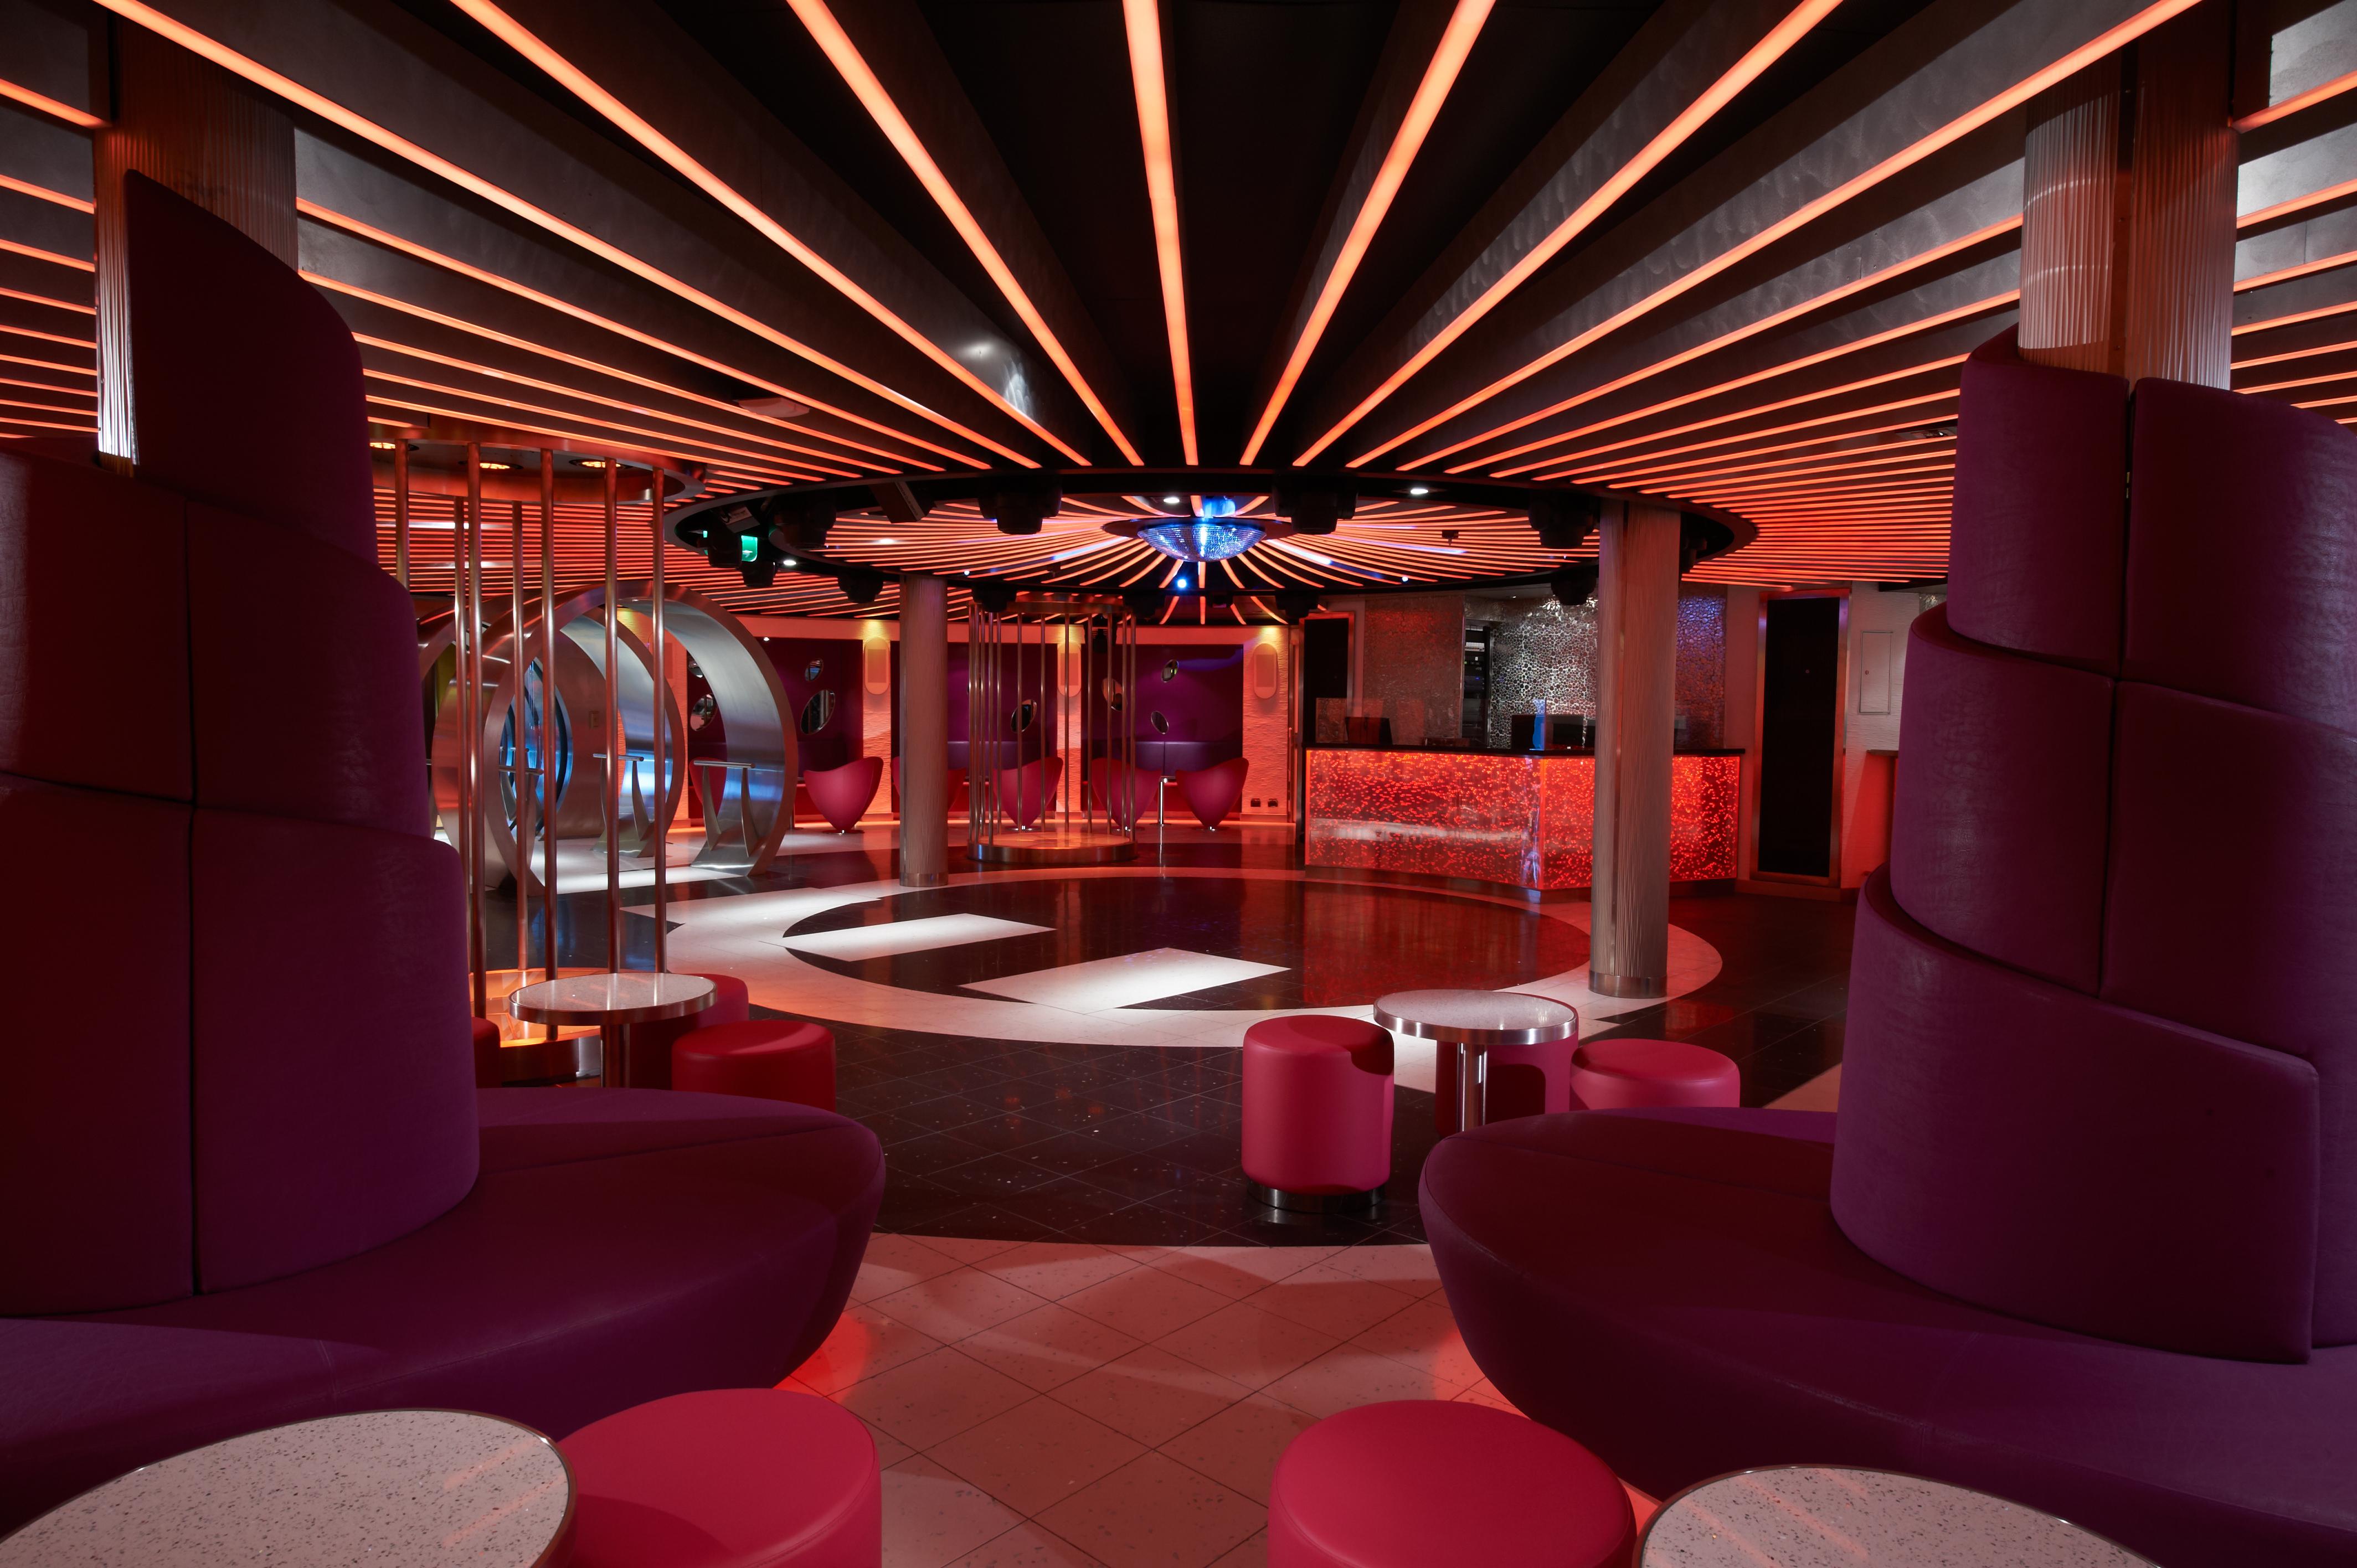 Carnival Cruise Lines Carnival Breeze Liquid Nightclub 1.jpg